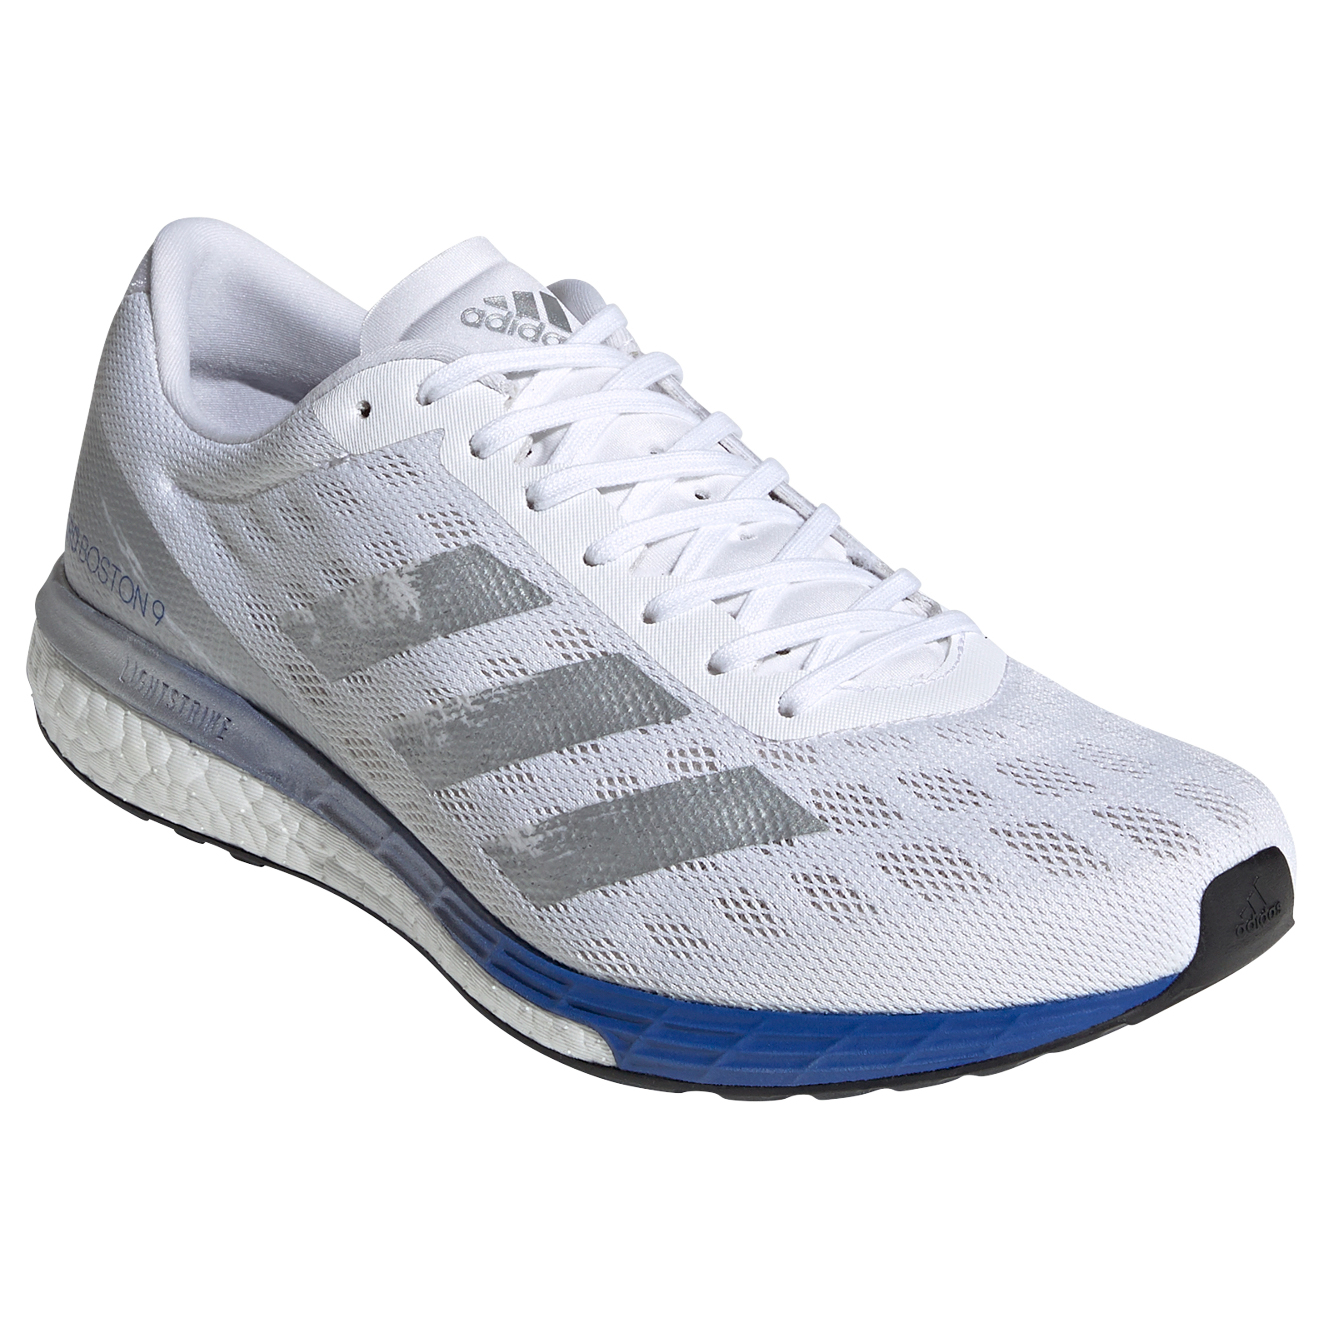 adidas - Adizero Boston 9 - Running shoes - Ftwr White / Silver Metallic / Team Royal Blue | 8 (UK)